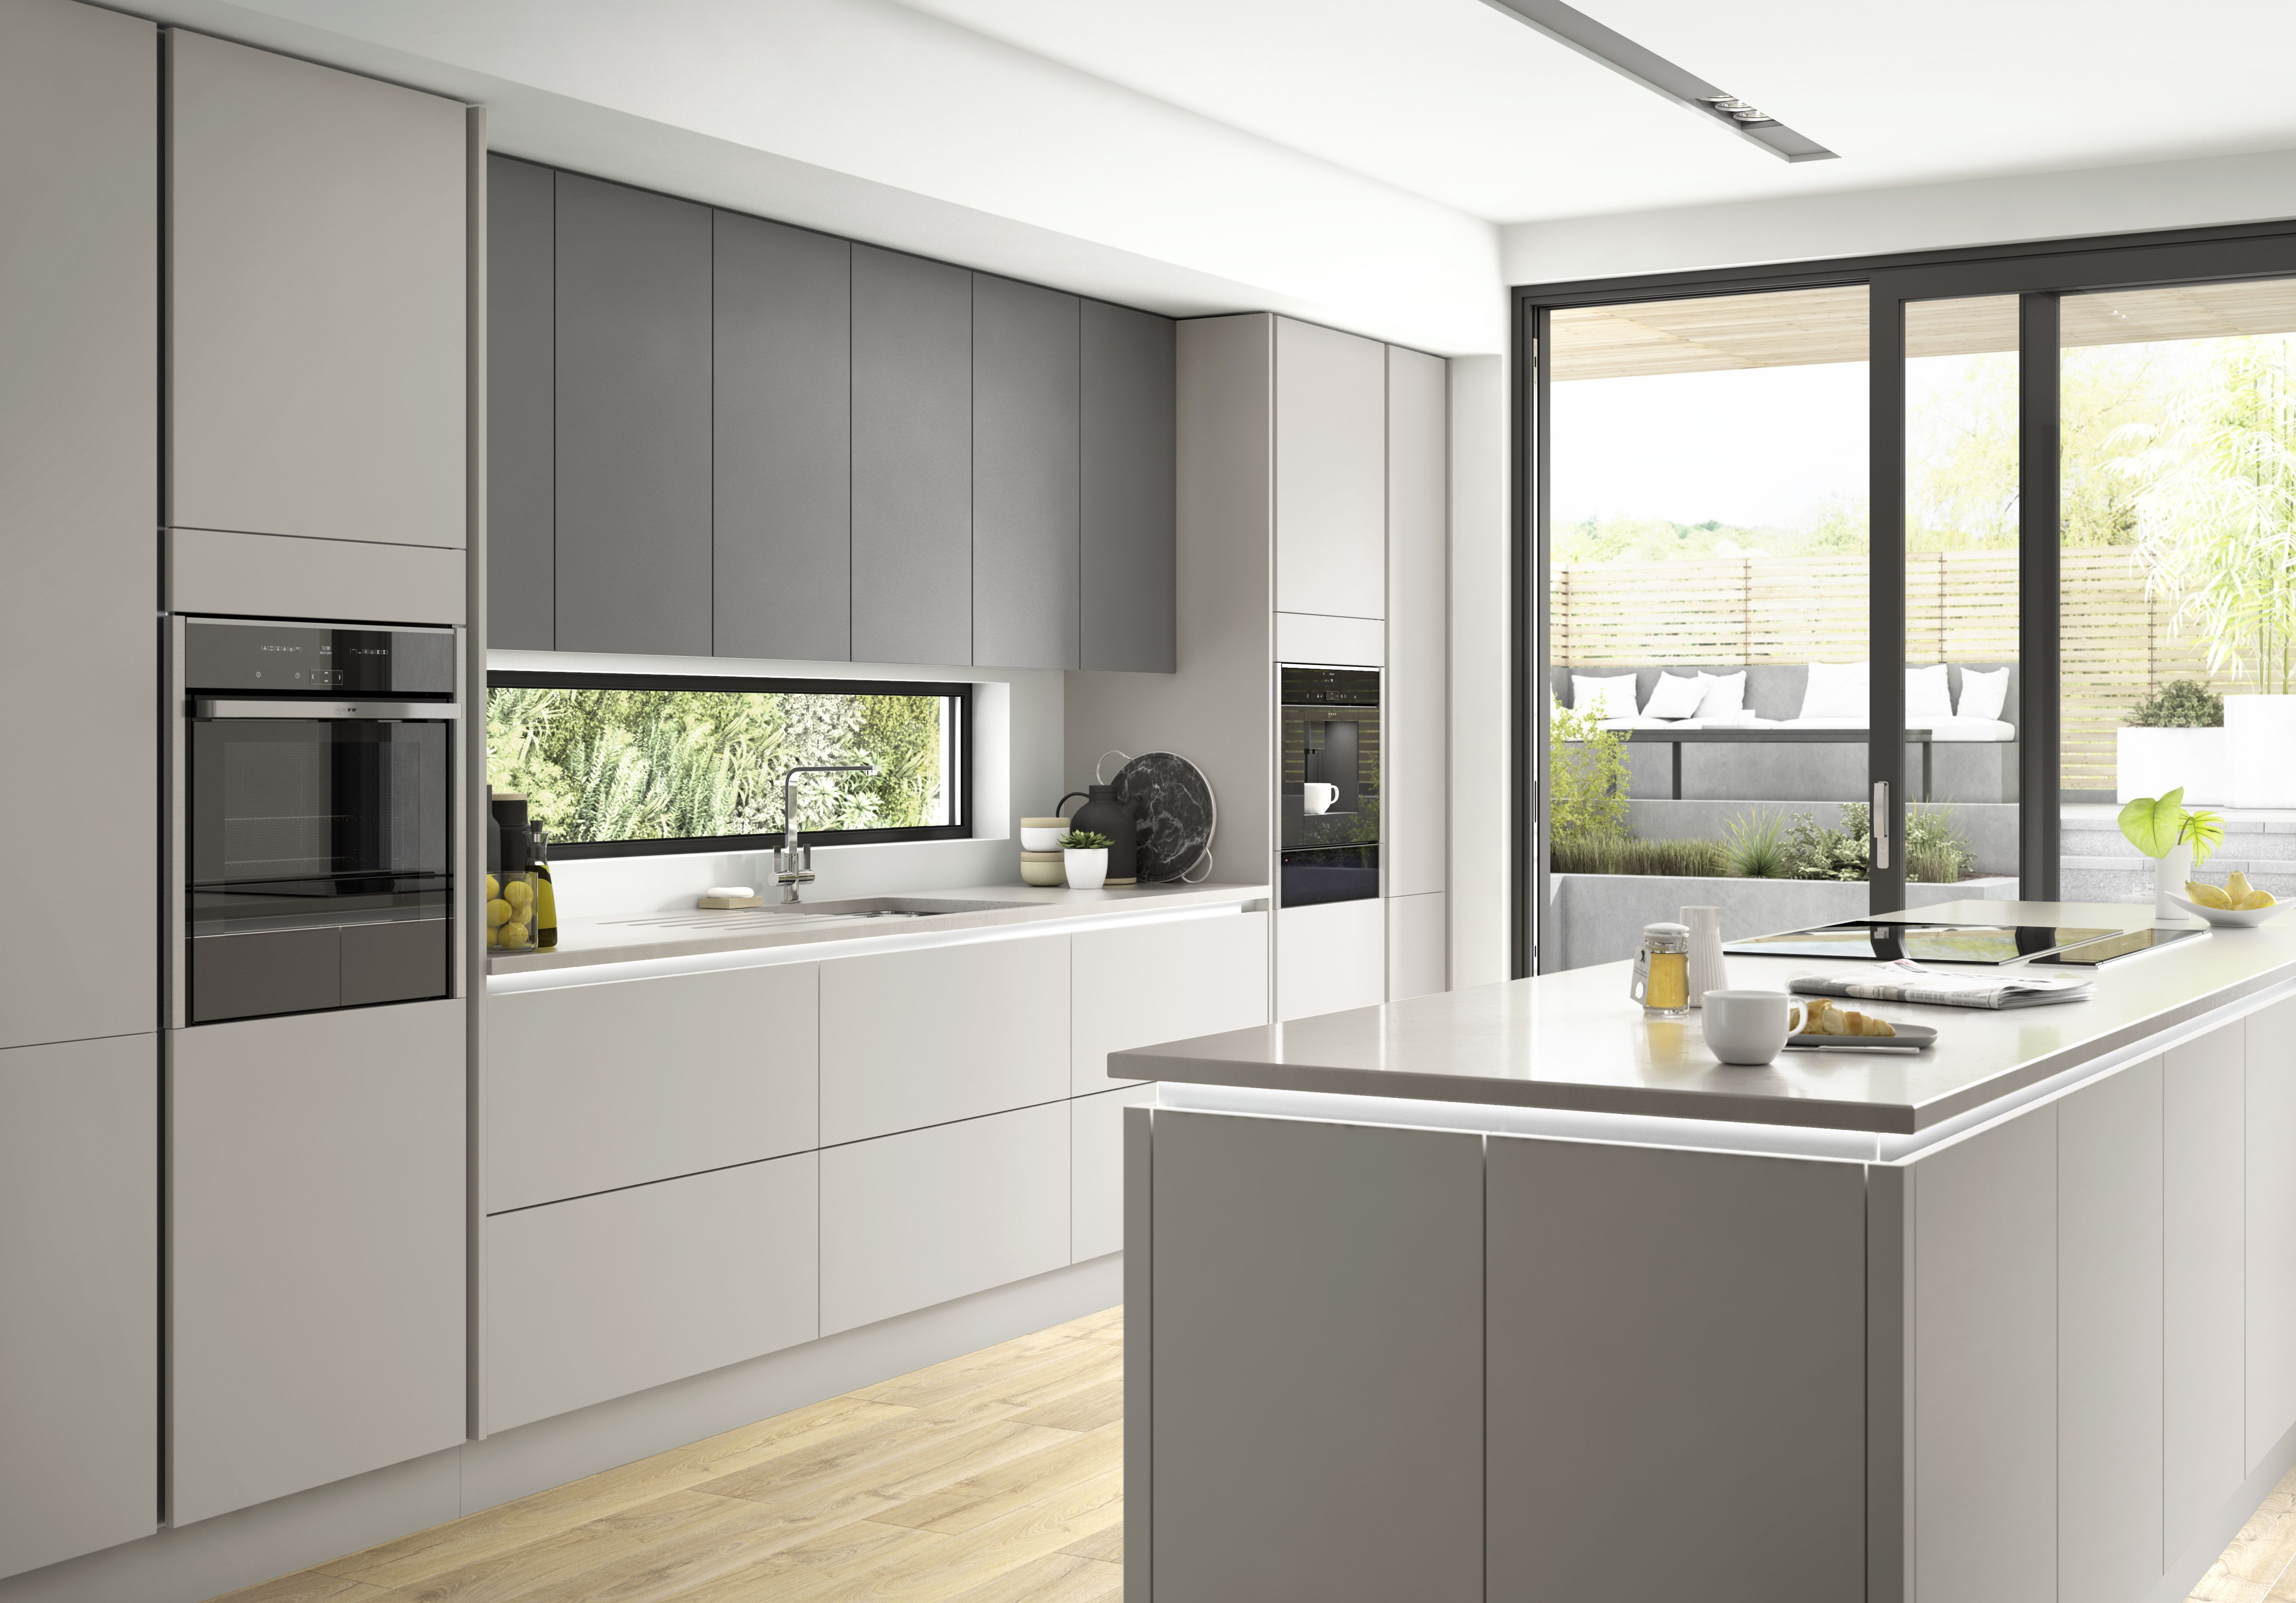 Two Tone Handleless Design Modern Grey Kitchen Kitchen Room Design Kitchen Remodel Trends